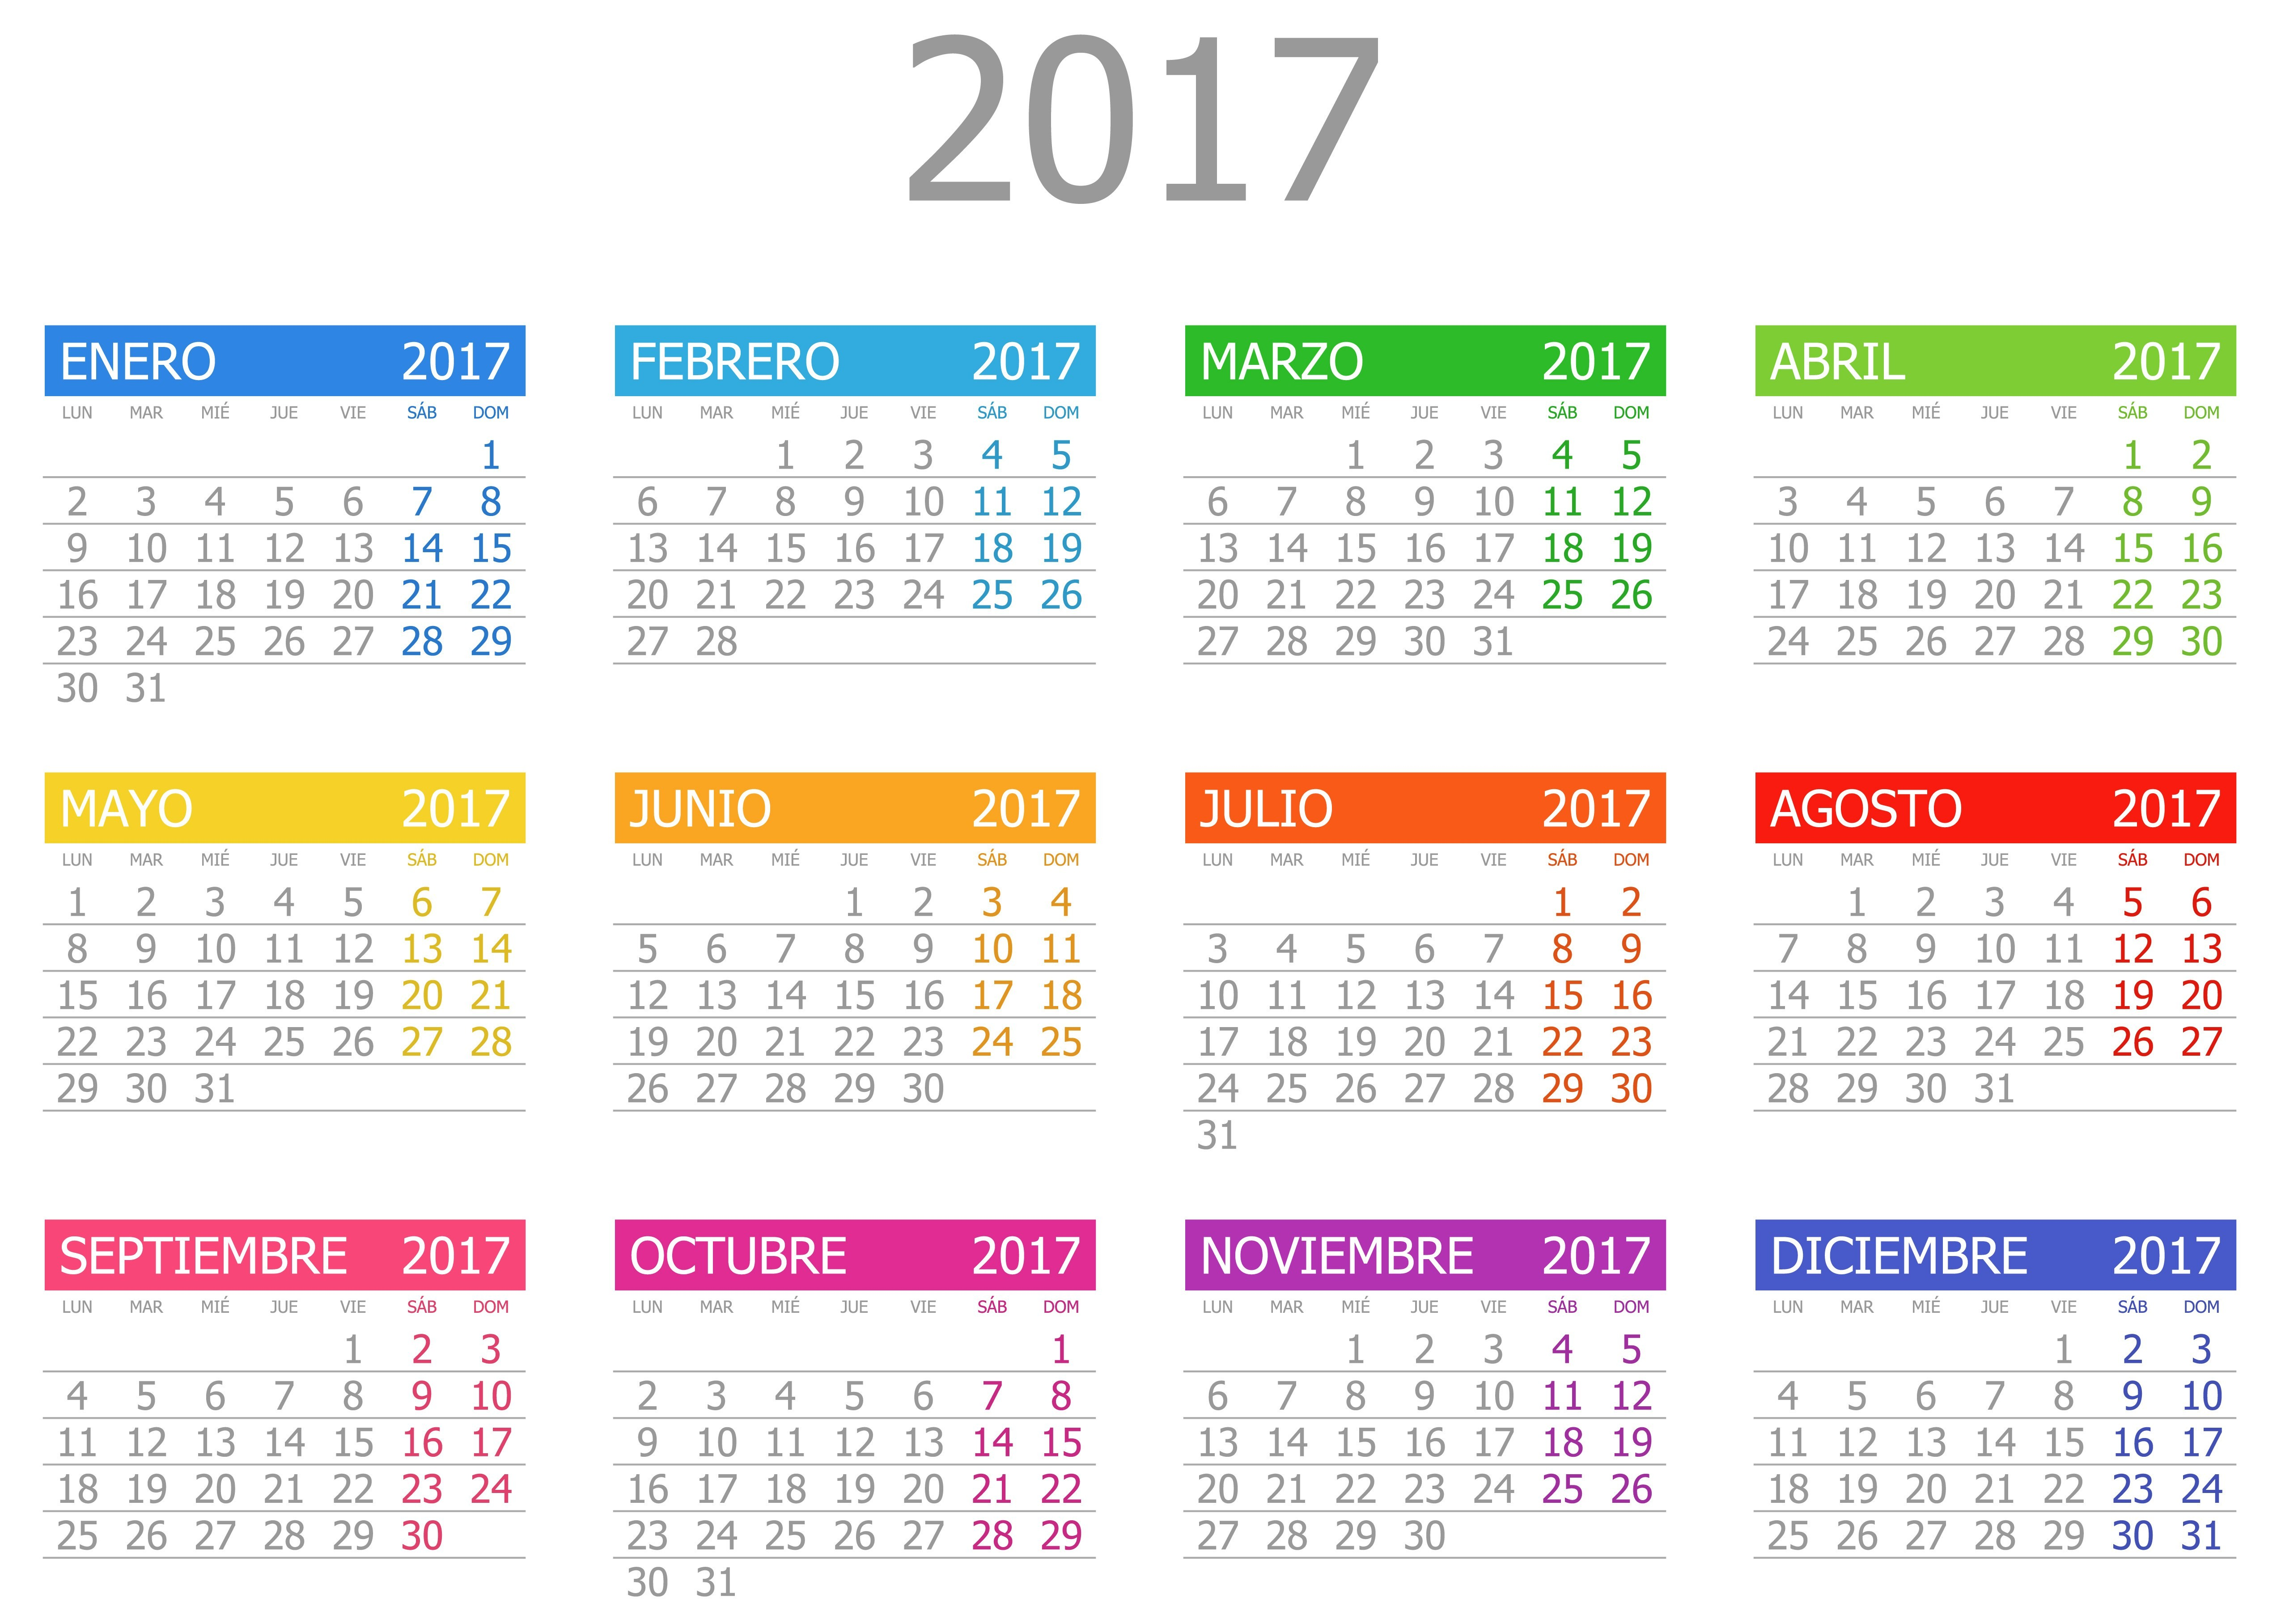 Calendario Mensual 2019 Para Imprimir Bonito Más Populares Imprimir Calendario Cheap Calendario Enero Para Imprimir Agosto Of Calendario Mensual 2019 Para Imprimir Bonito Recientes Pin De Calendario Hispano En Calendario Con Feriados A±o 2019